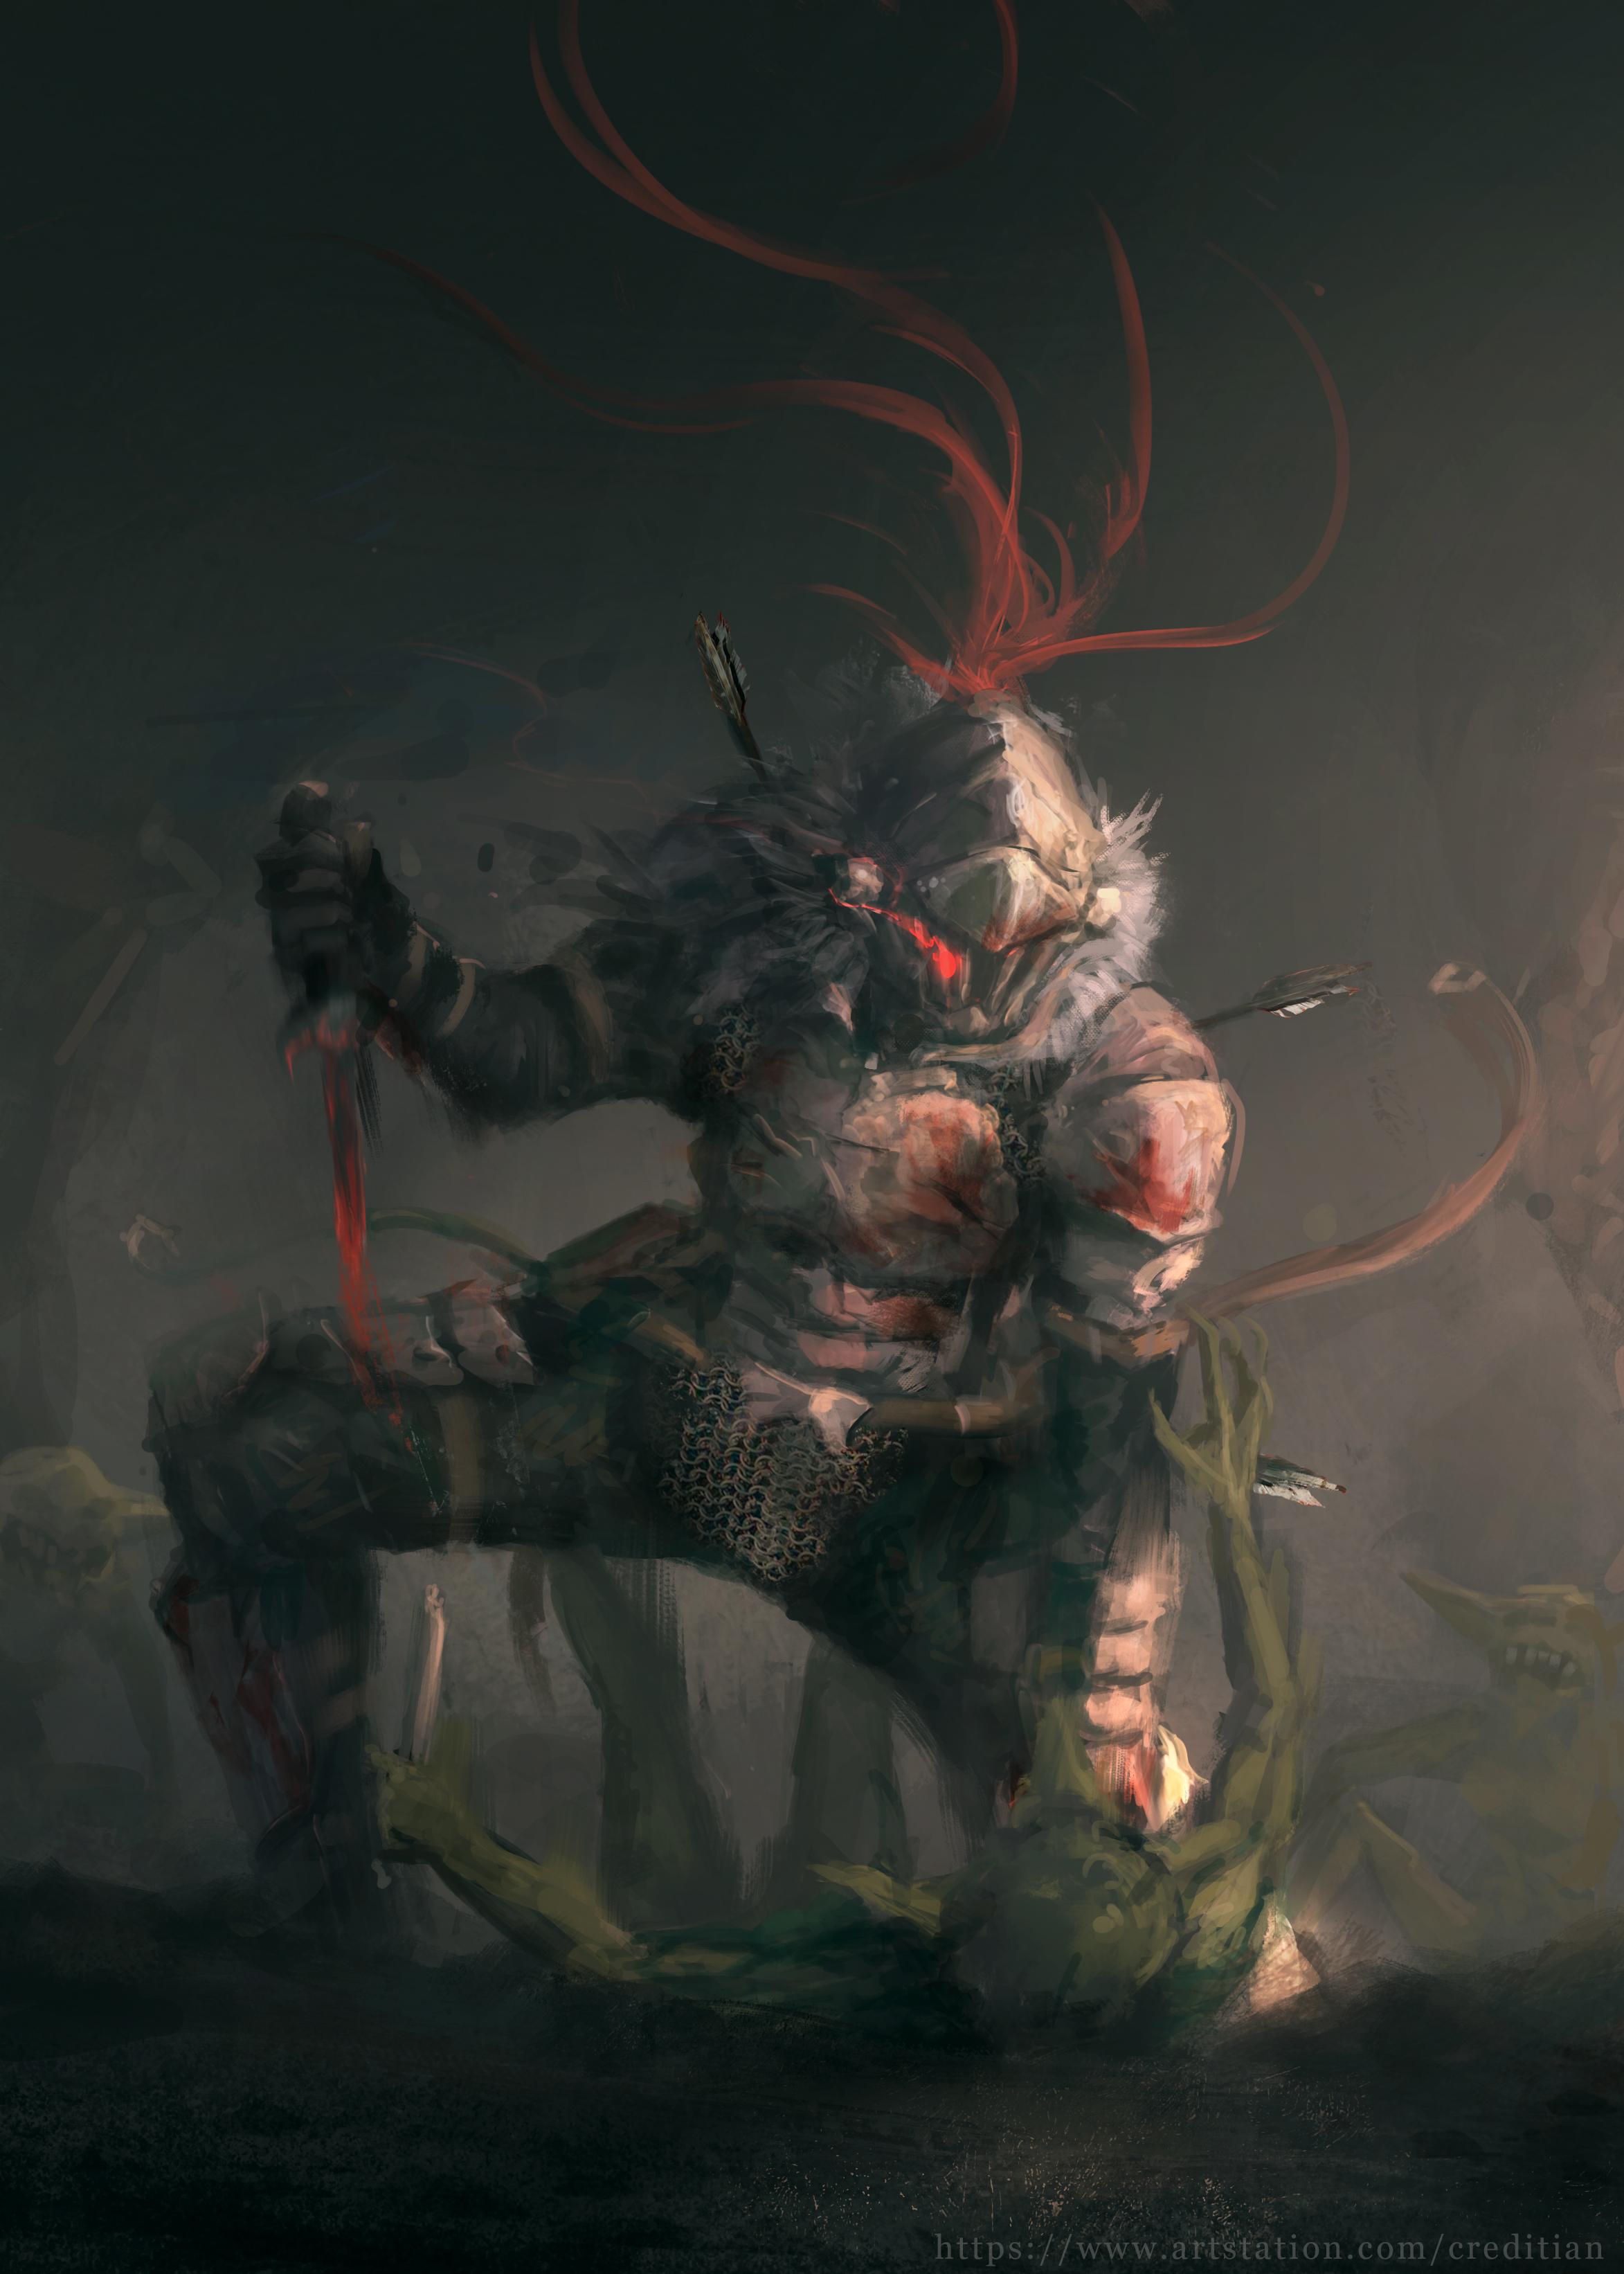 Wallpaper anime goblin slayer 2346x3284 lolnarty - Hobgoblin wallpaper ...